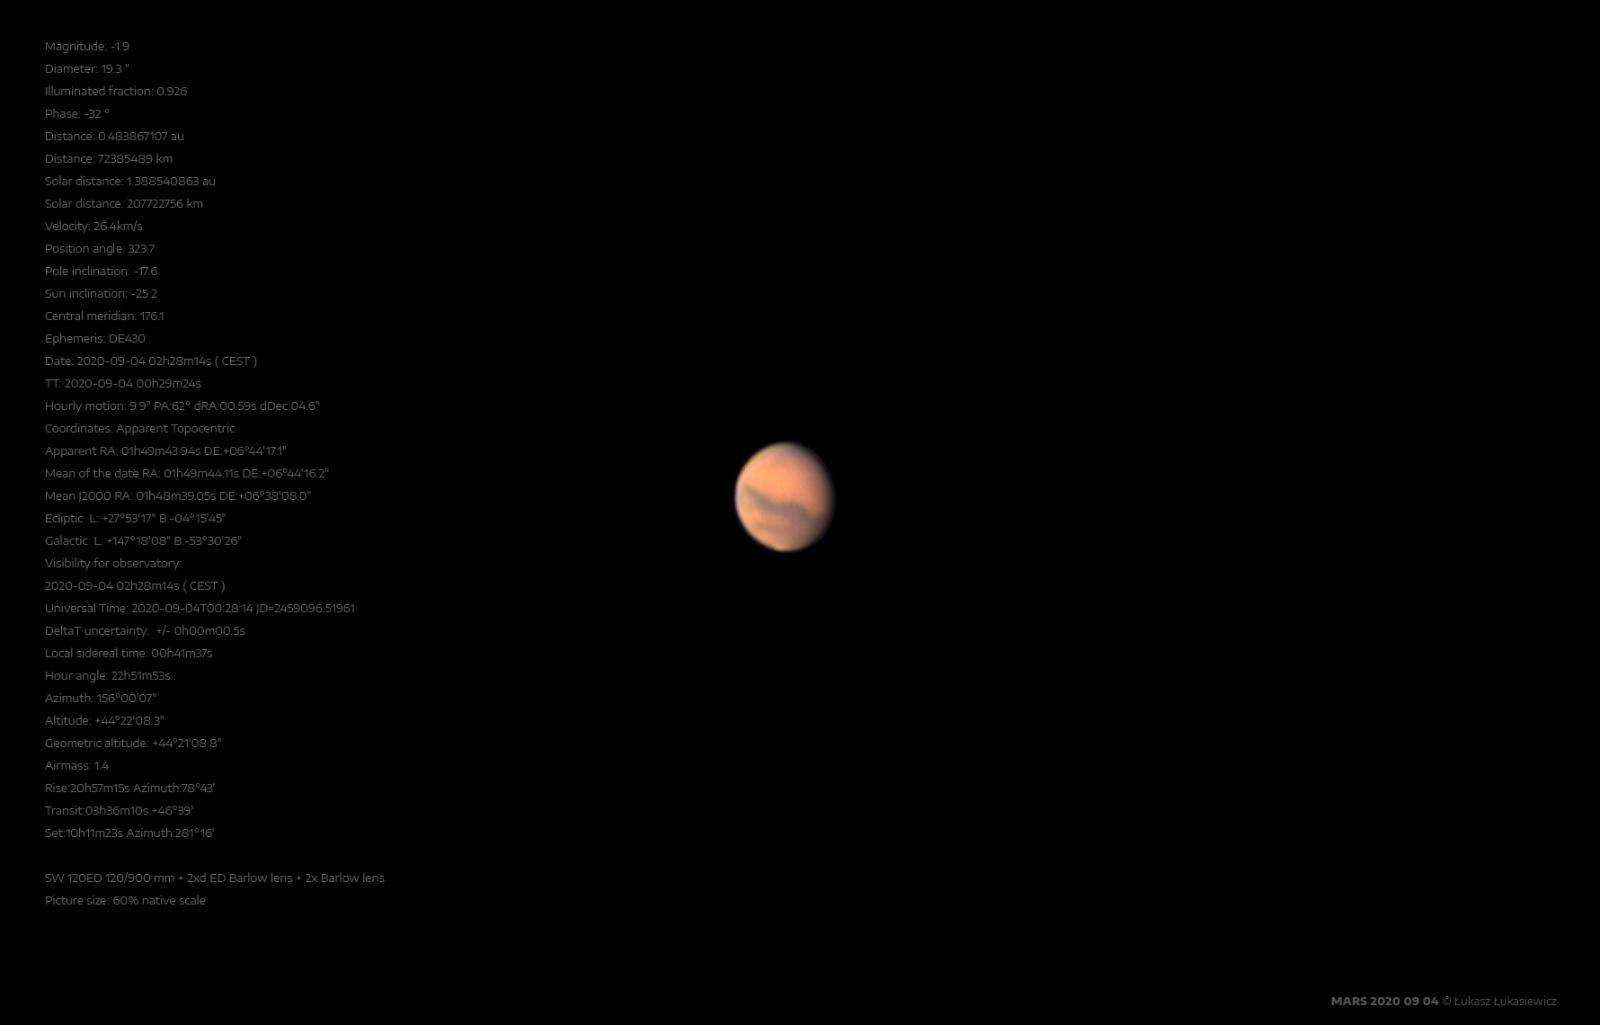 MARS-2020-09-04d.thumb.png.84ec934b88ddad19f2cf4b7a268ae6e1.png